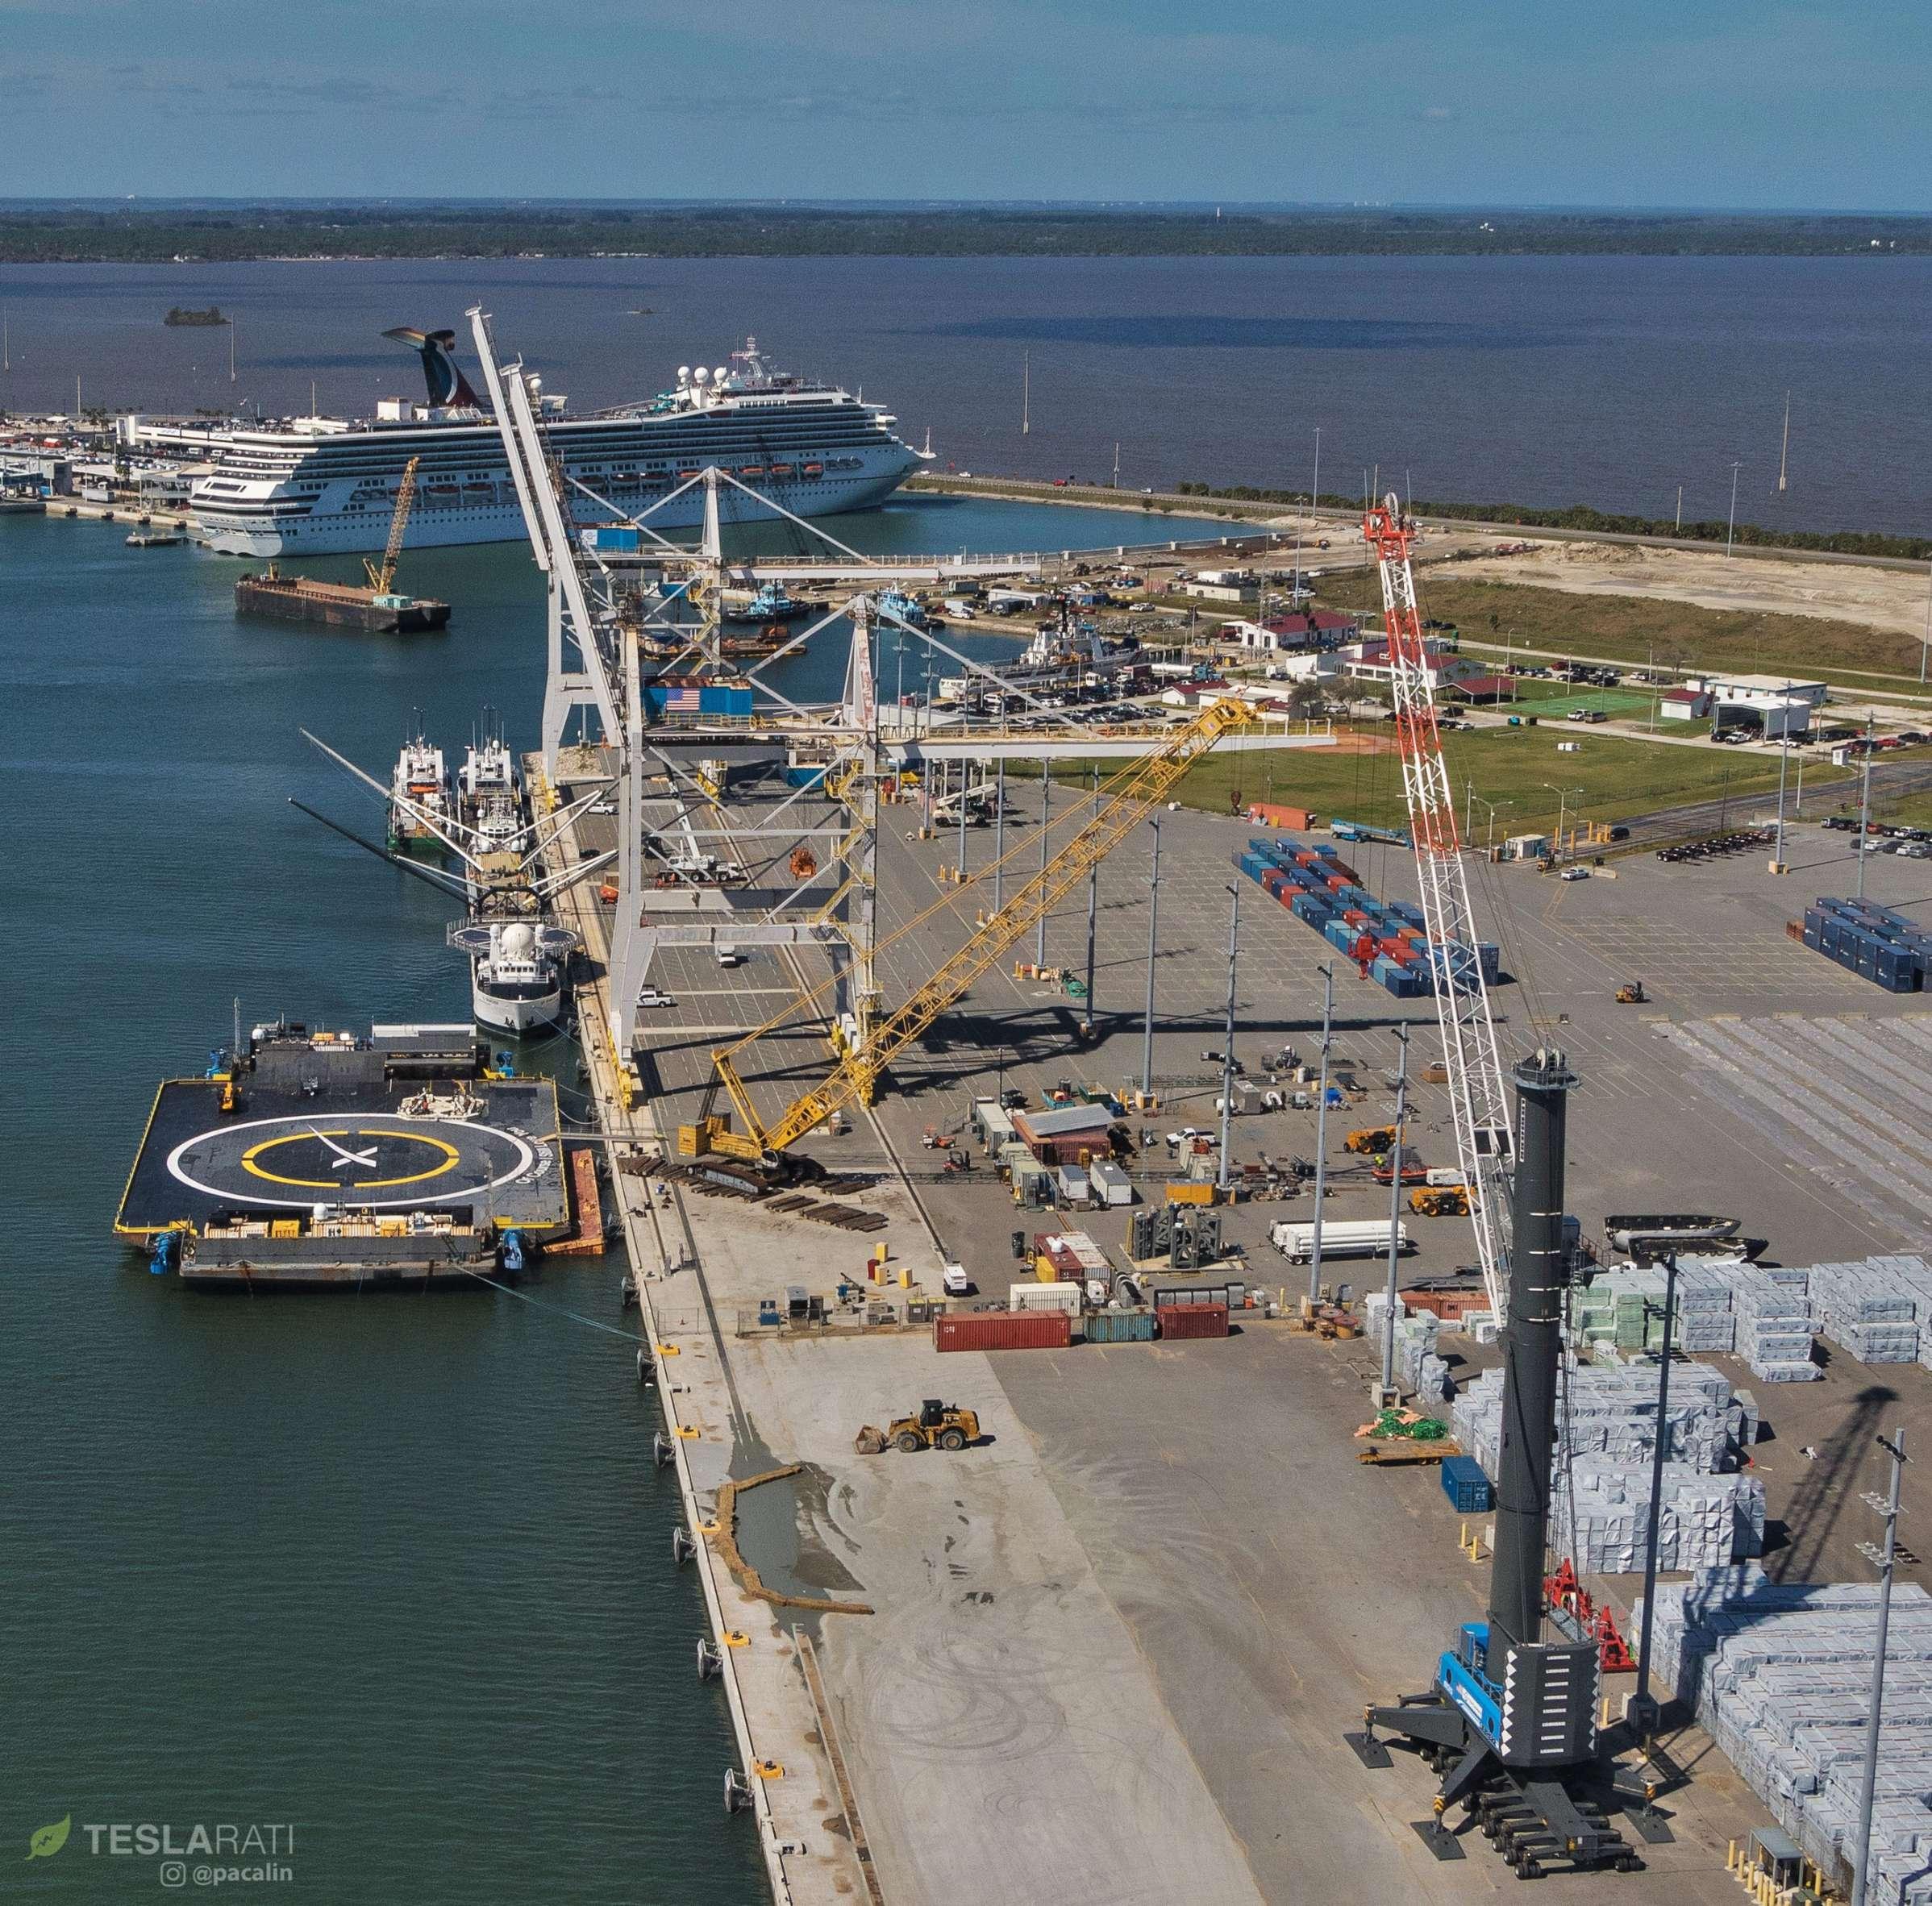 SpaceX East Coast fleet Mr Steven OCISLY Searcher 021419 (Pauline Acalin) 3 (c)